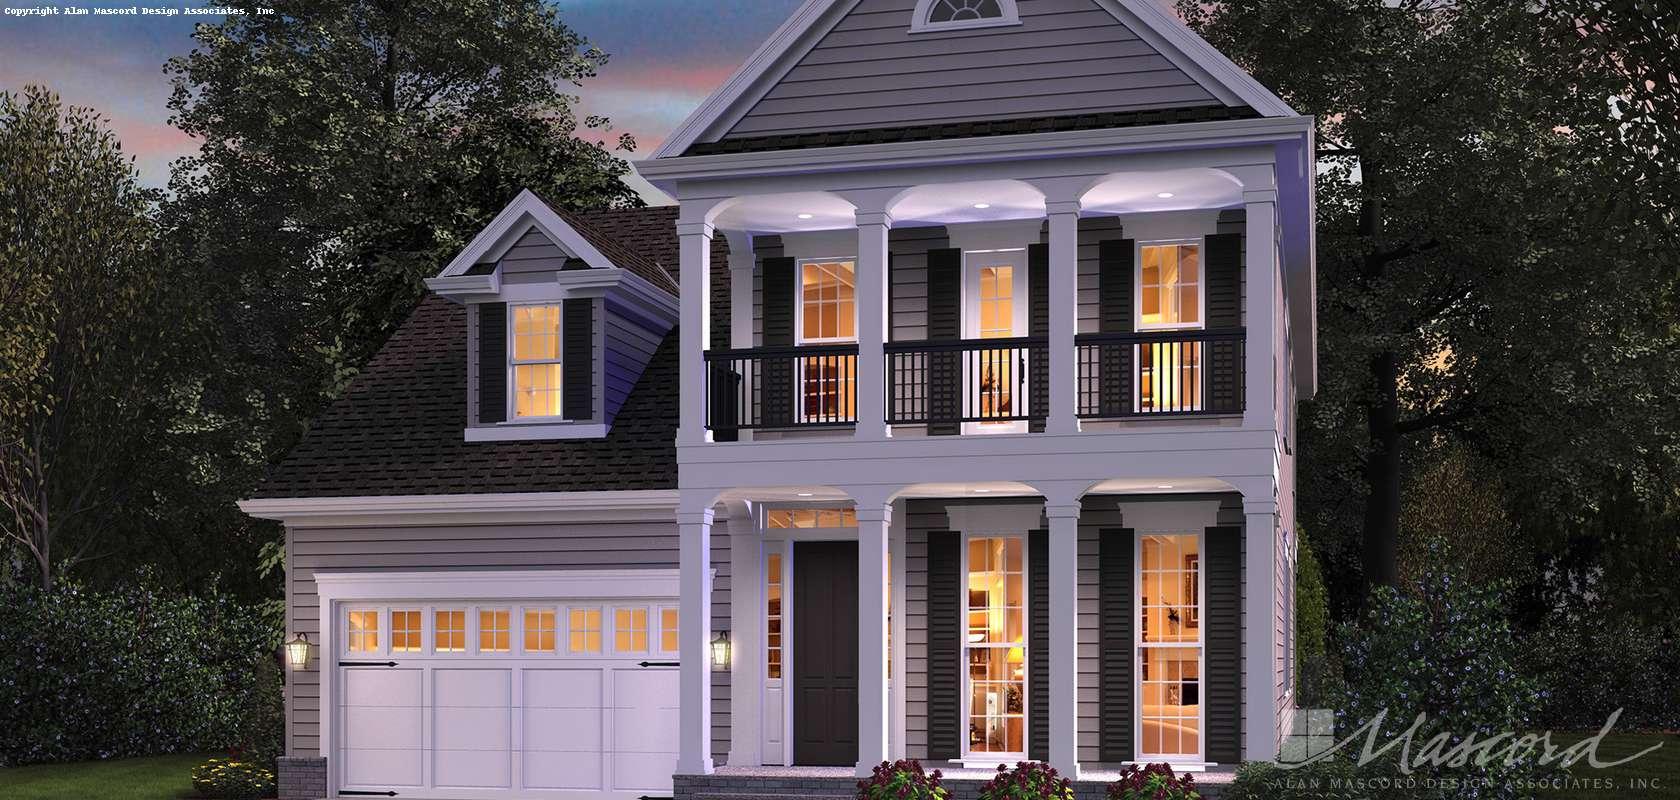 Mascord House Plan B22189: The